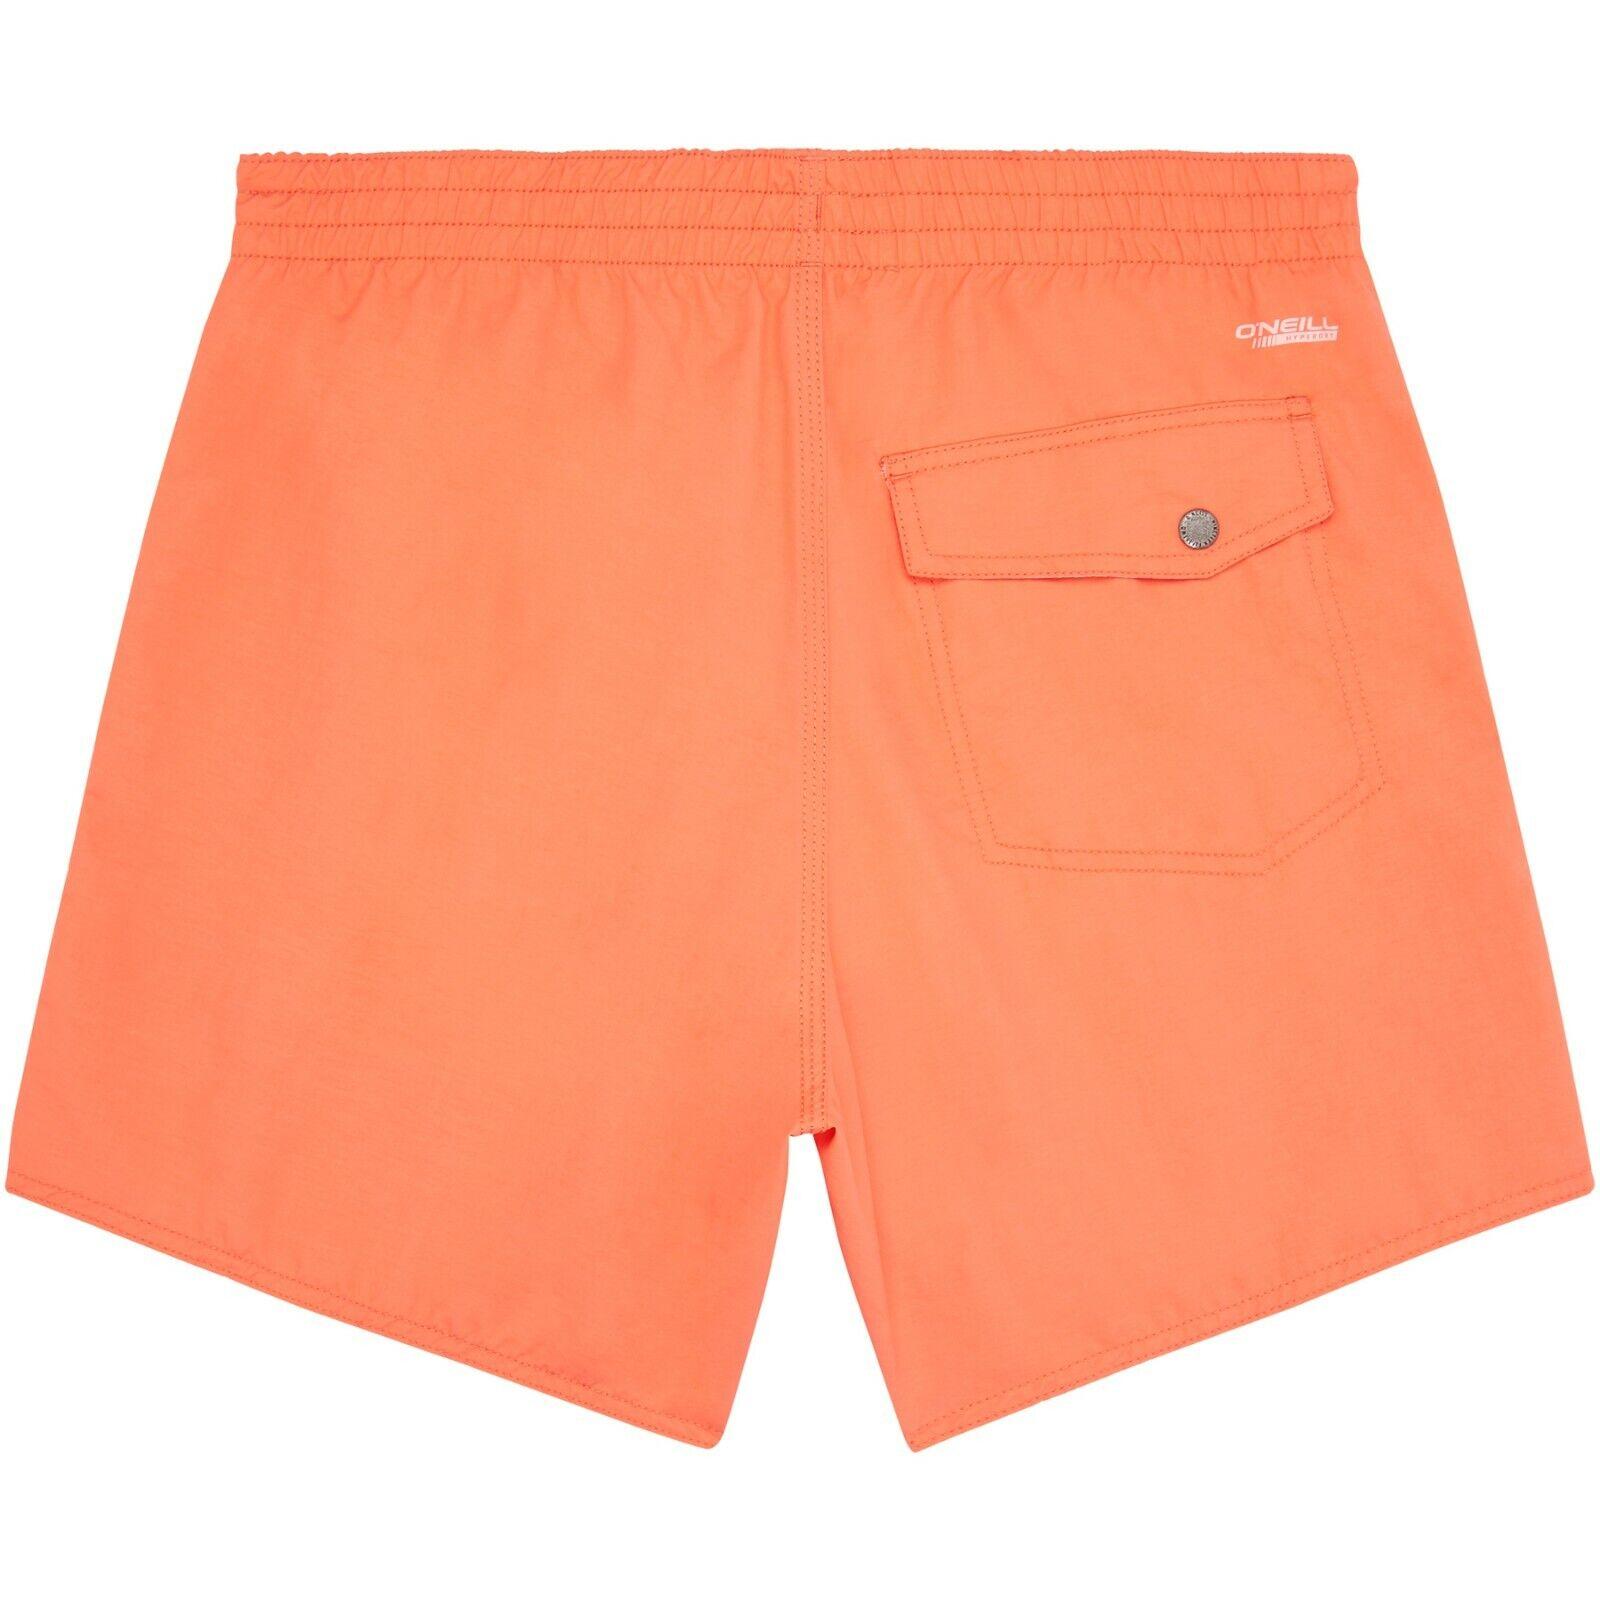 O'NEILL MENS SWIM SHORTS.Grün Orange Orange Orange HYPER DRY LINED SWIMMING BOARDIES 9S 24 25  | Shop  bade6d